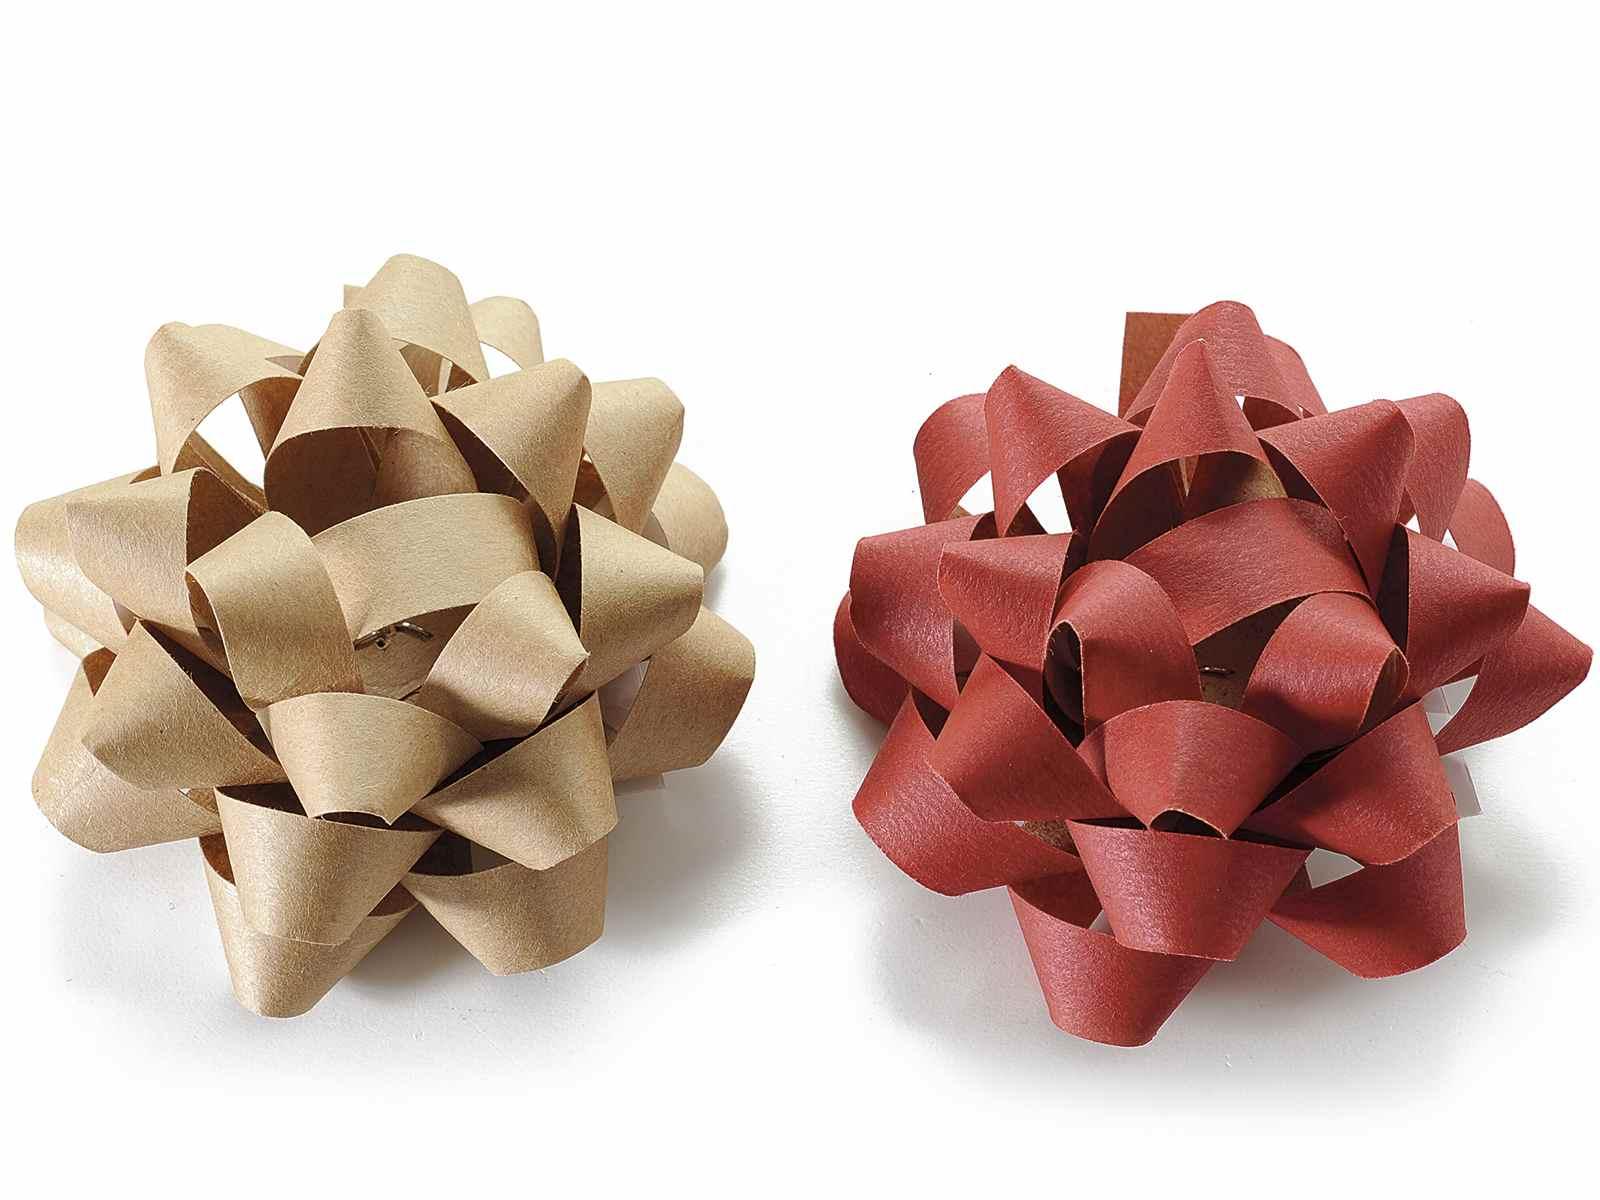 bo te 35 noeuds cadeau en papier assortis avec adhesifs art from italy. Black Bedroom Furniture Sets. Home Design Ideas